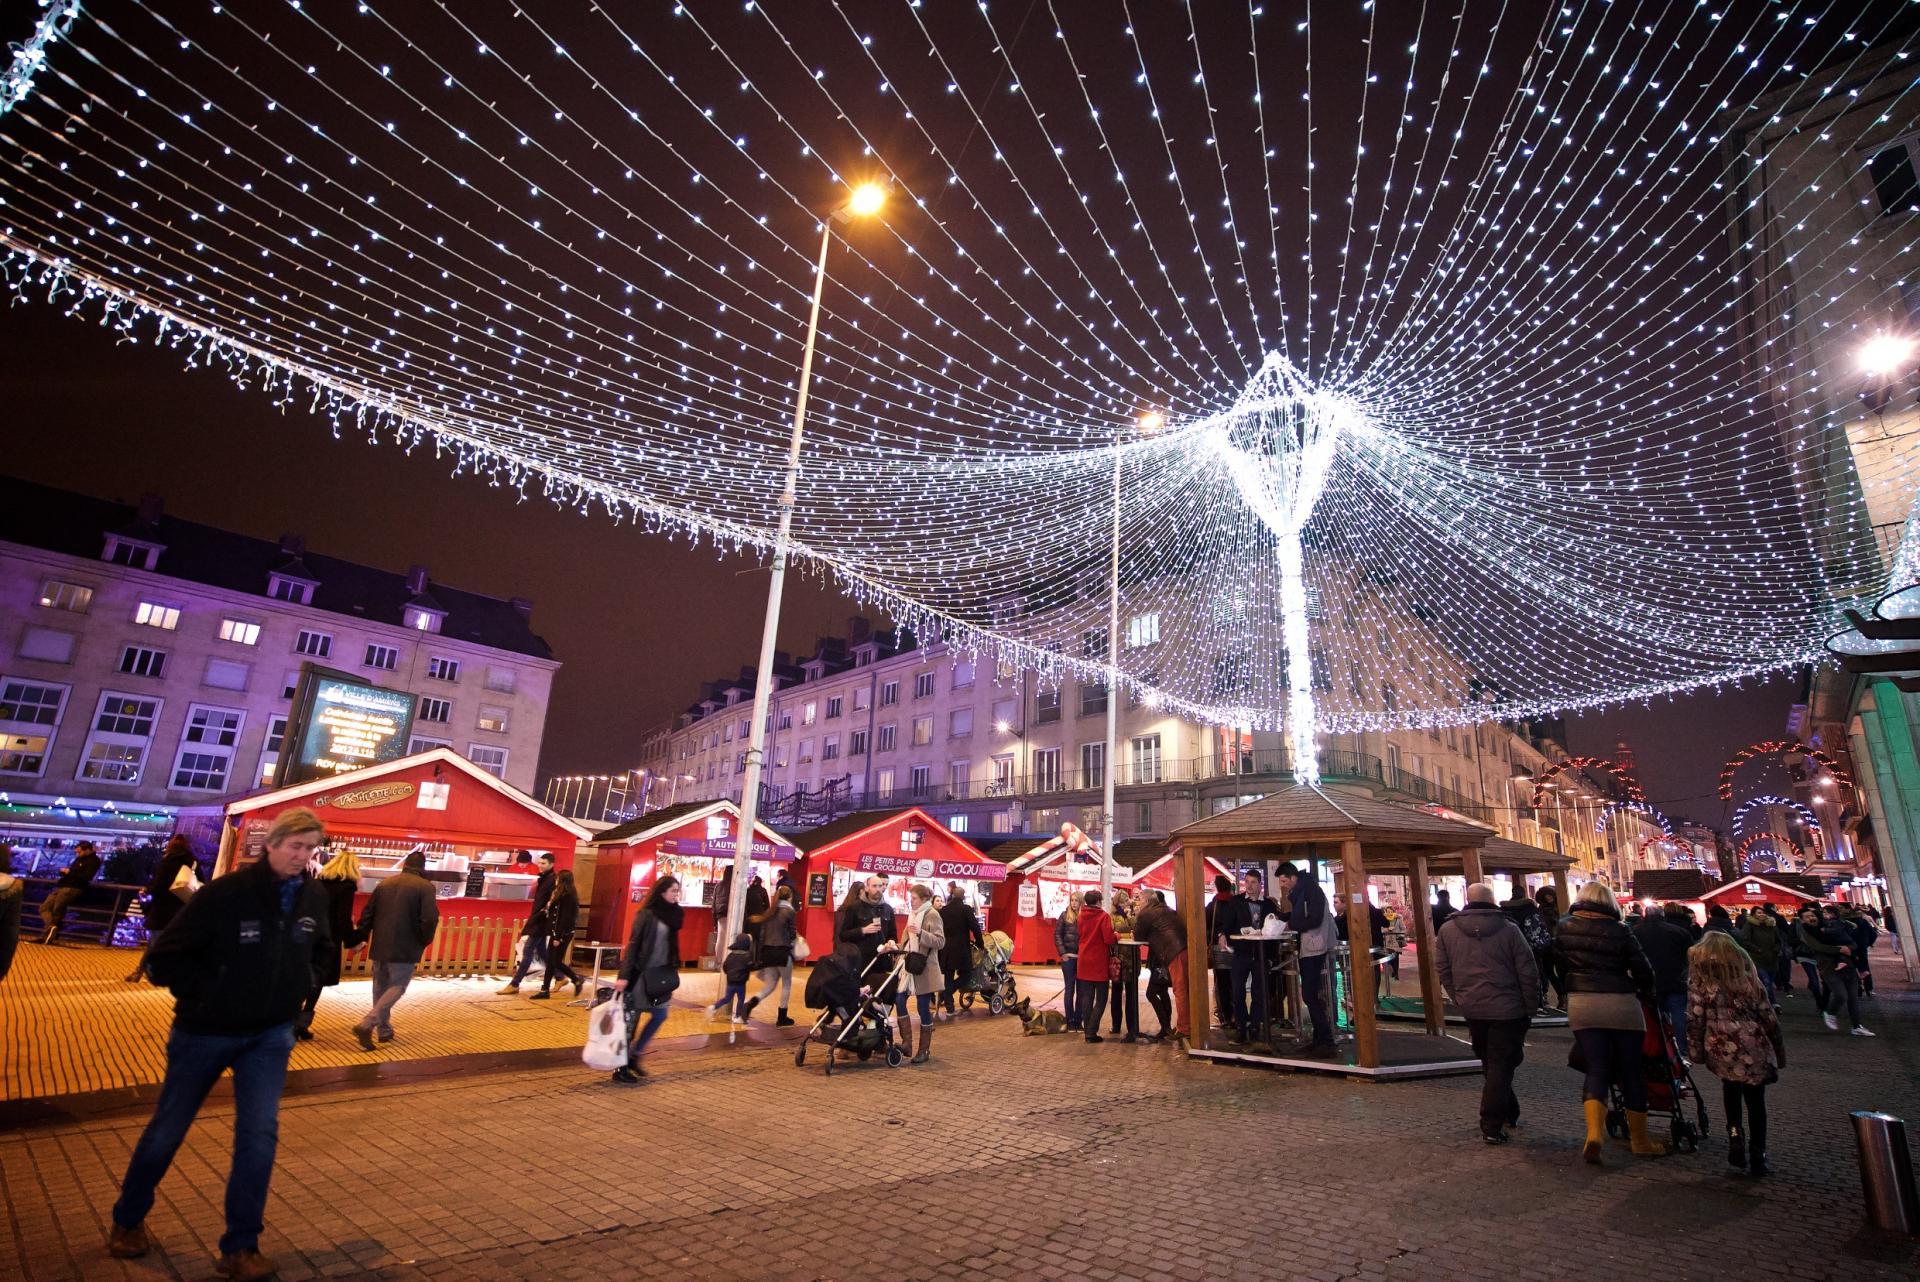 Place Gambetta Marché de Noël Amiens